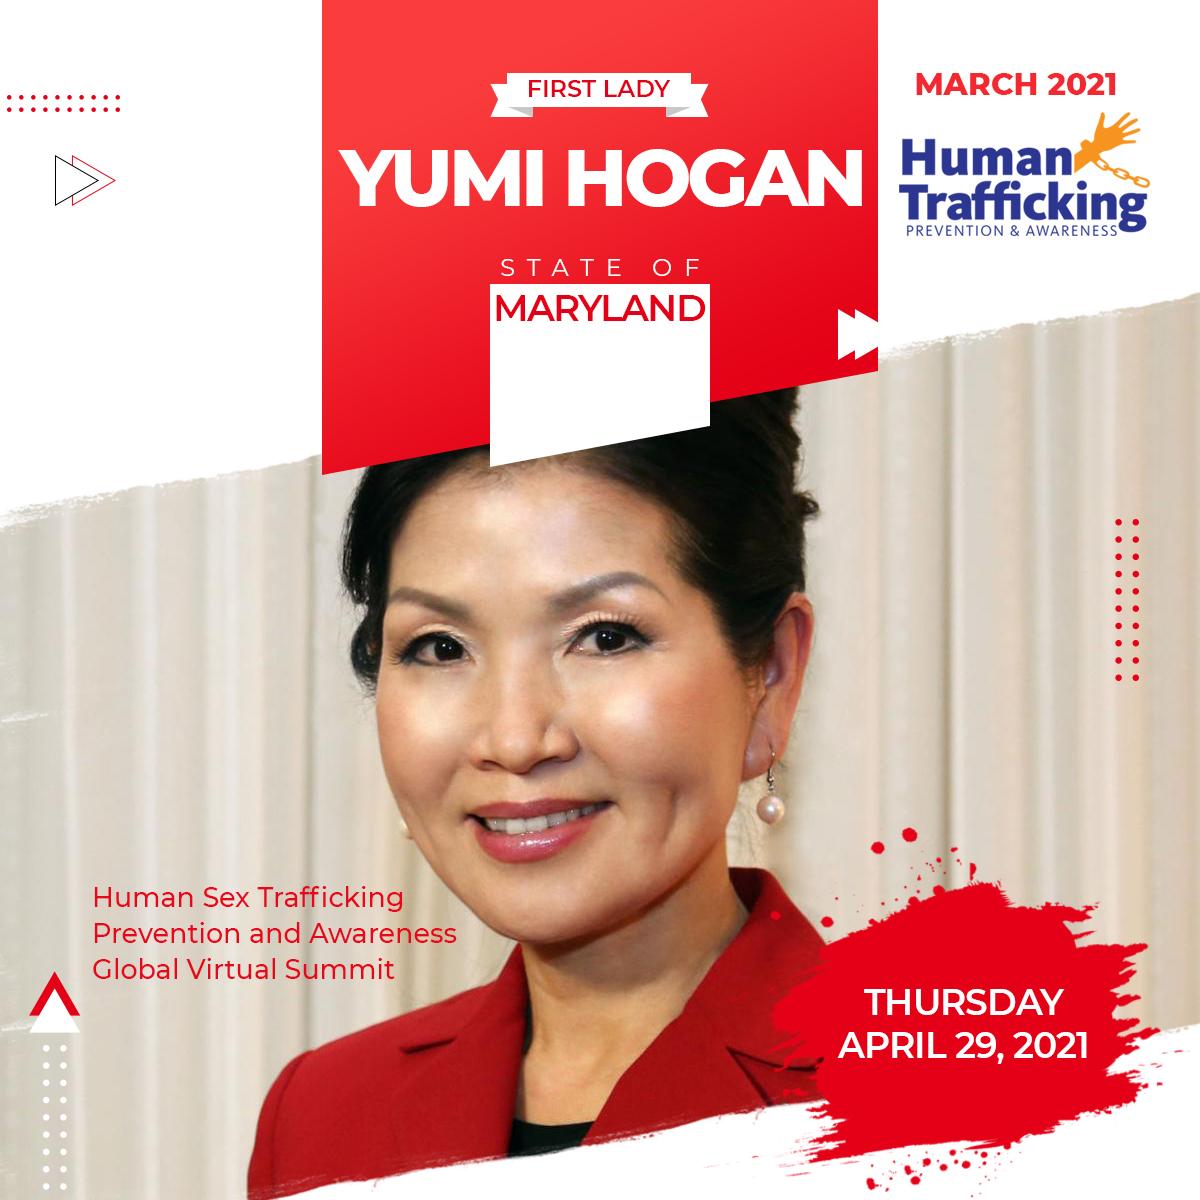 Anti-Human Trafficking – Save The Date